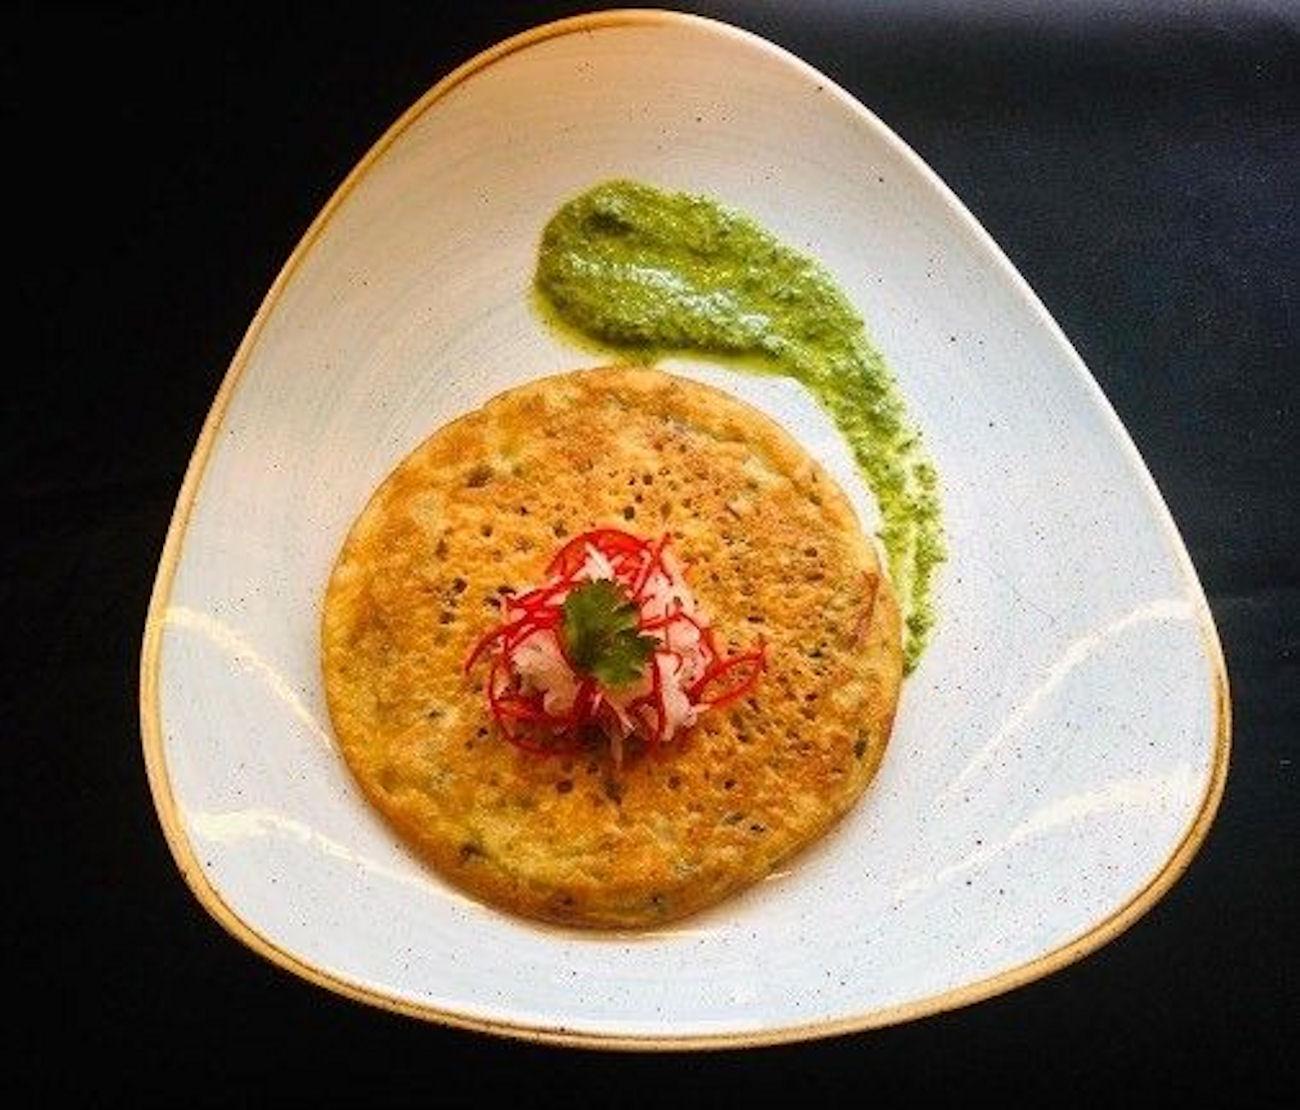 https://www.restaurantsofmanchester.com/cornexchange.htm